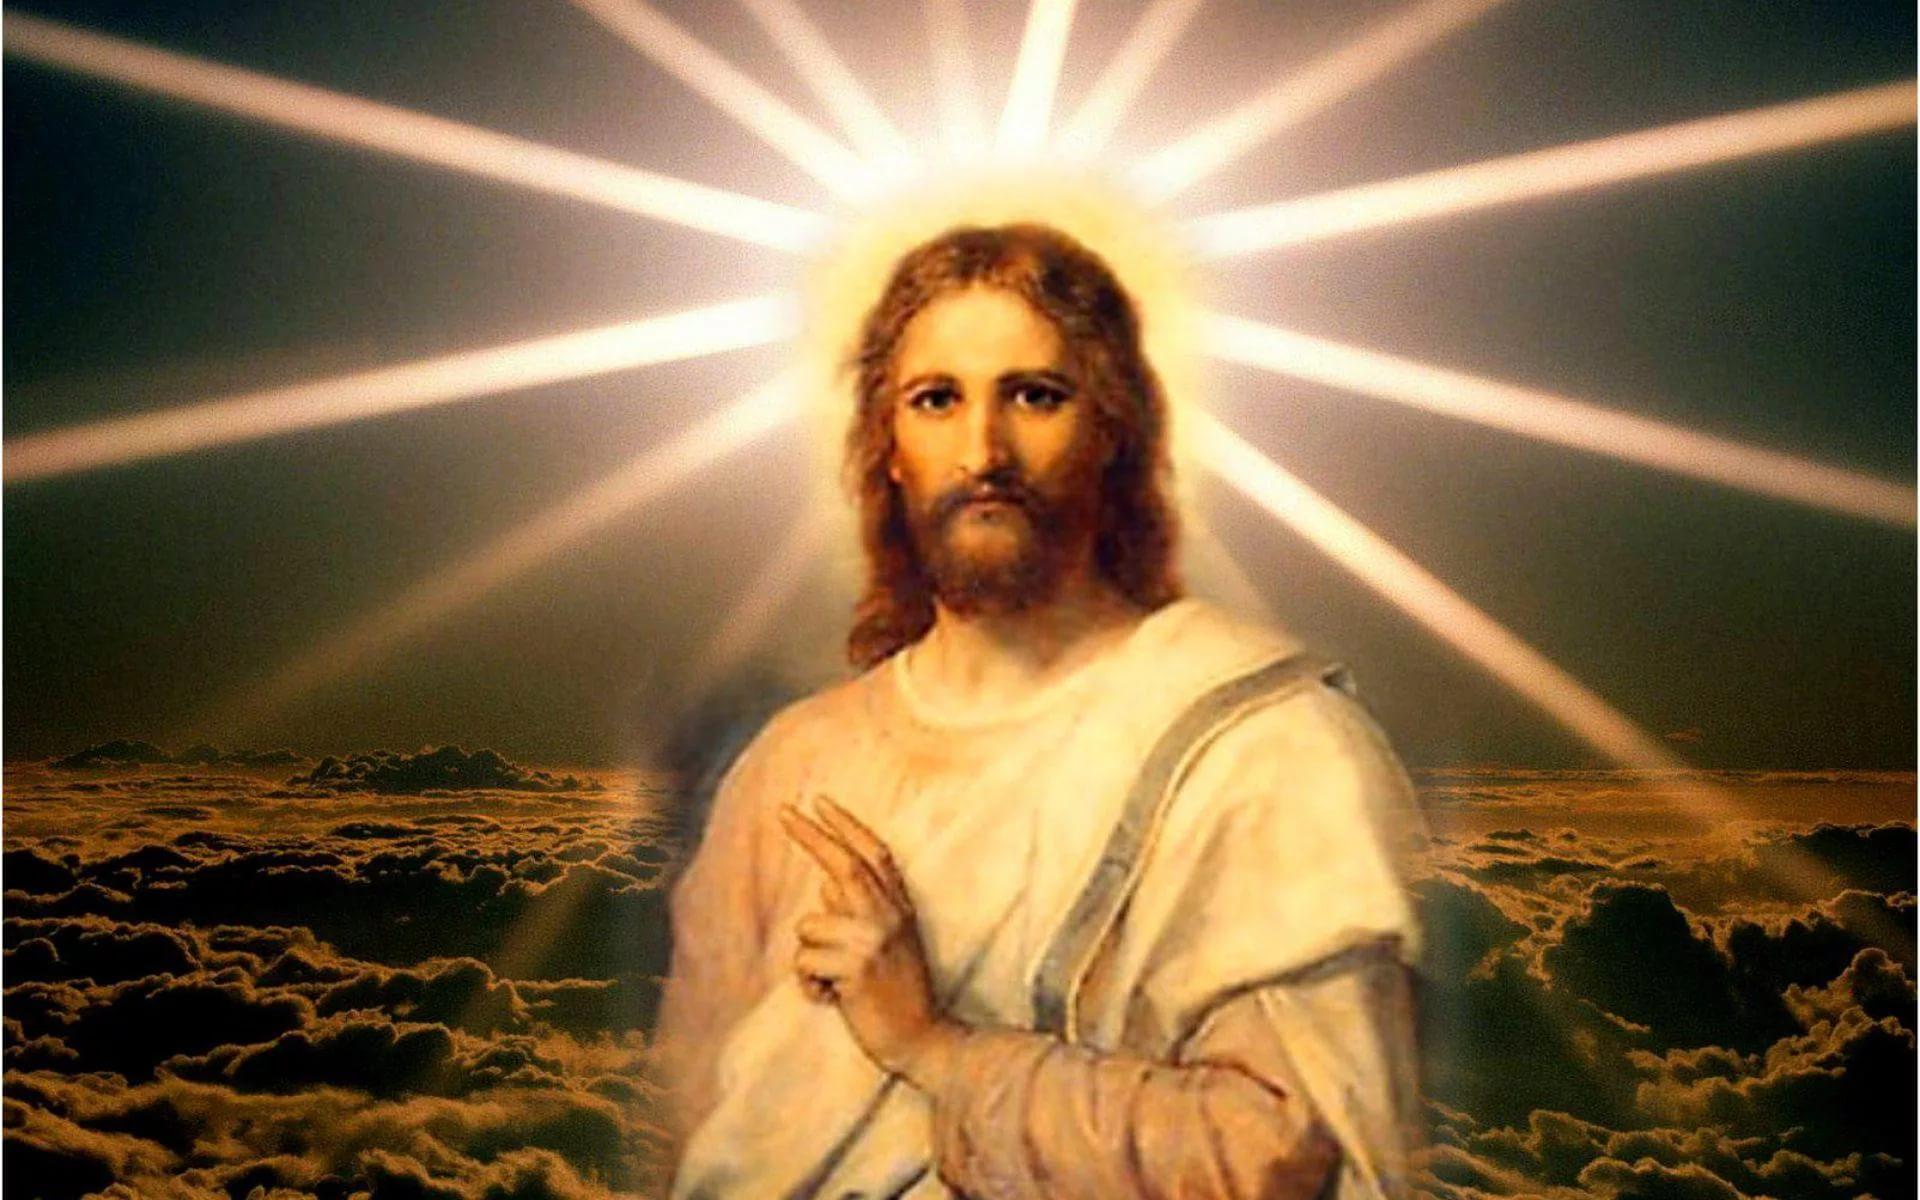 Картинки, картинка о боге красивая